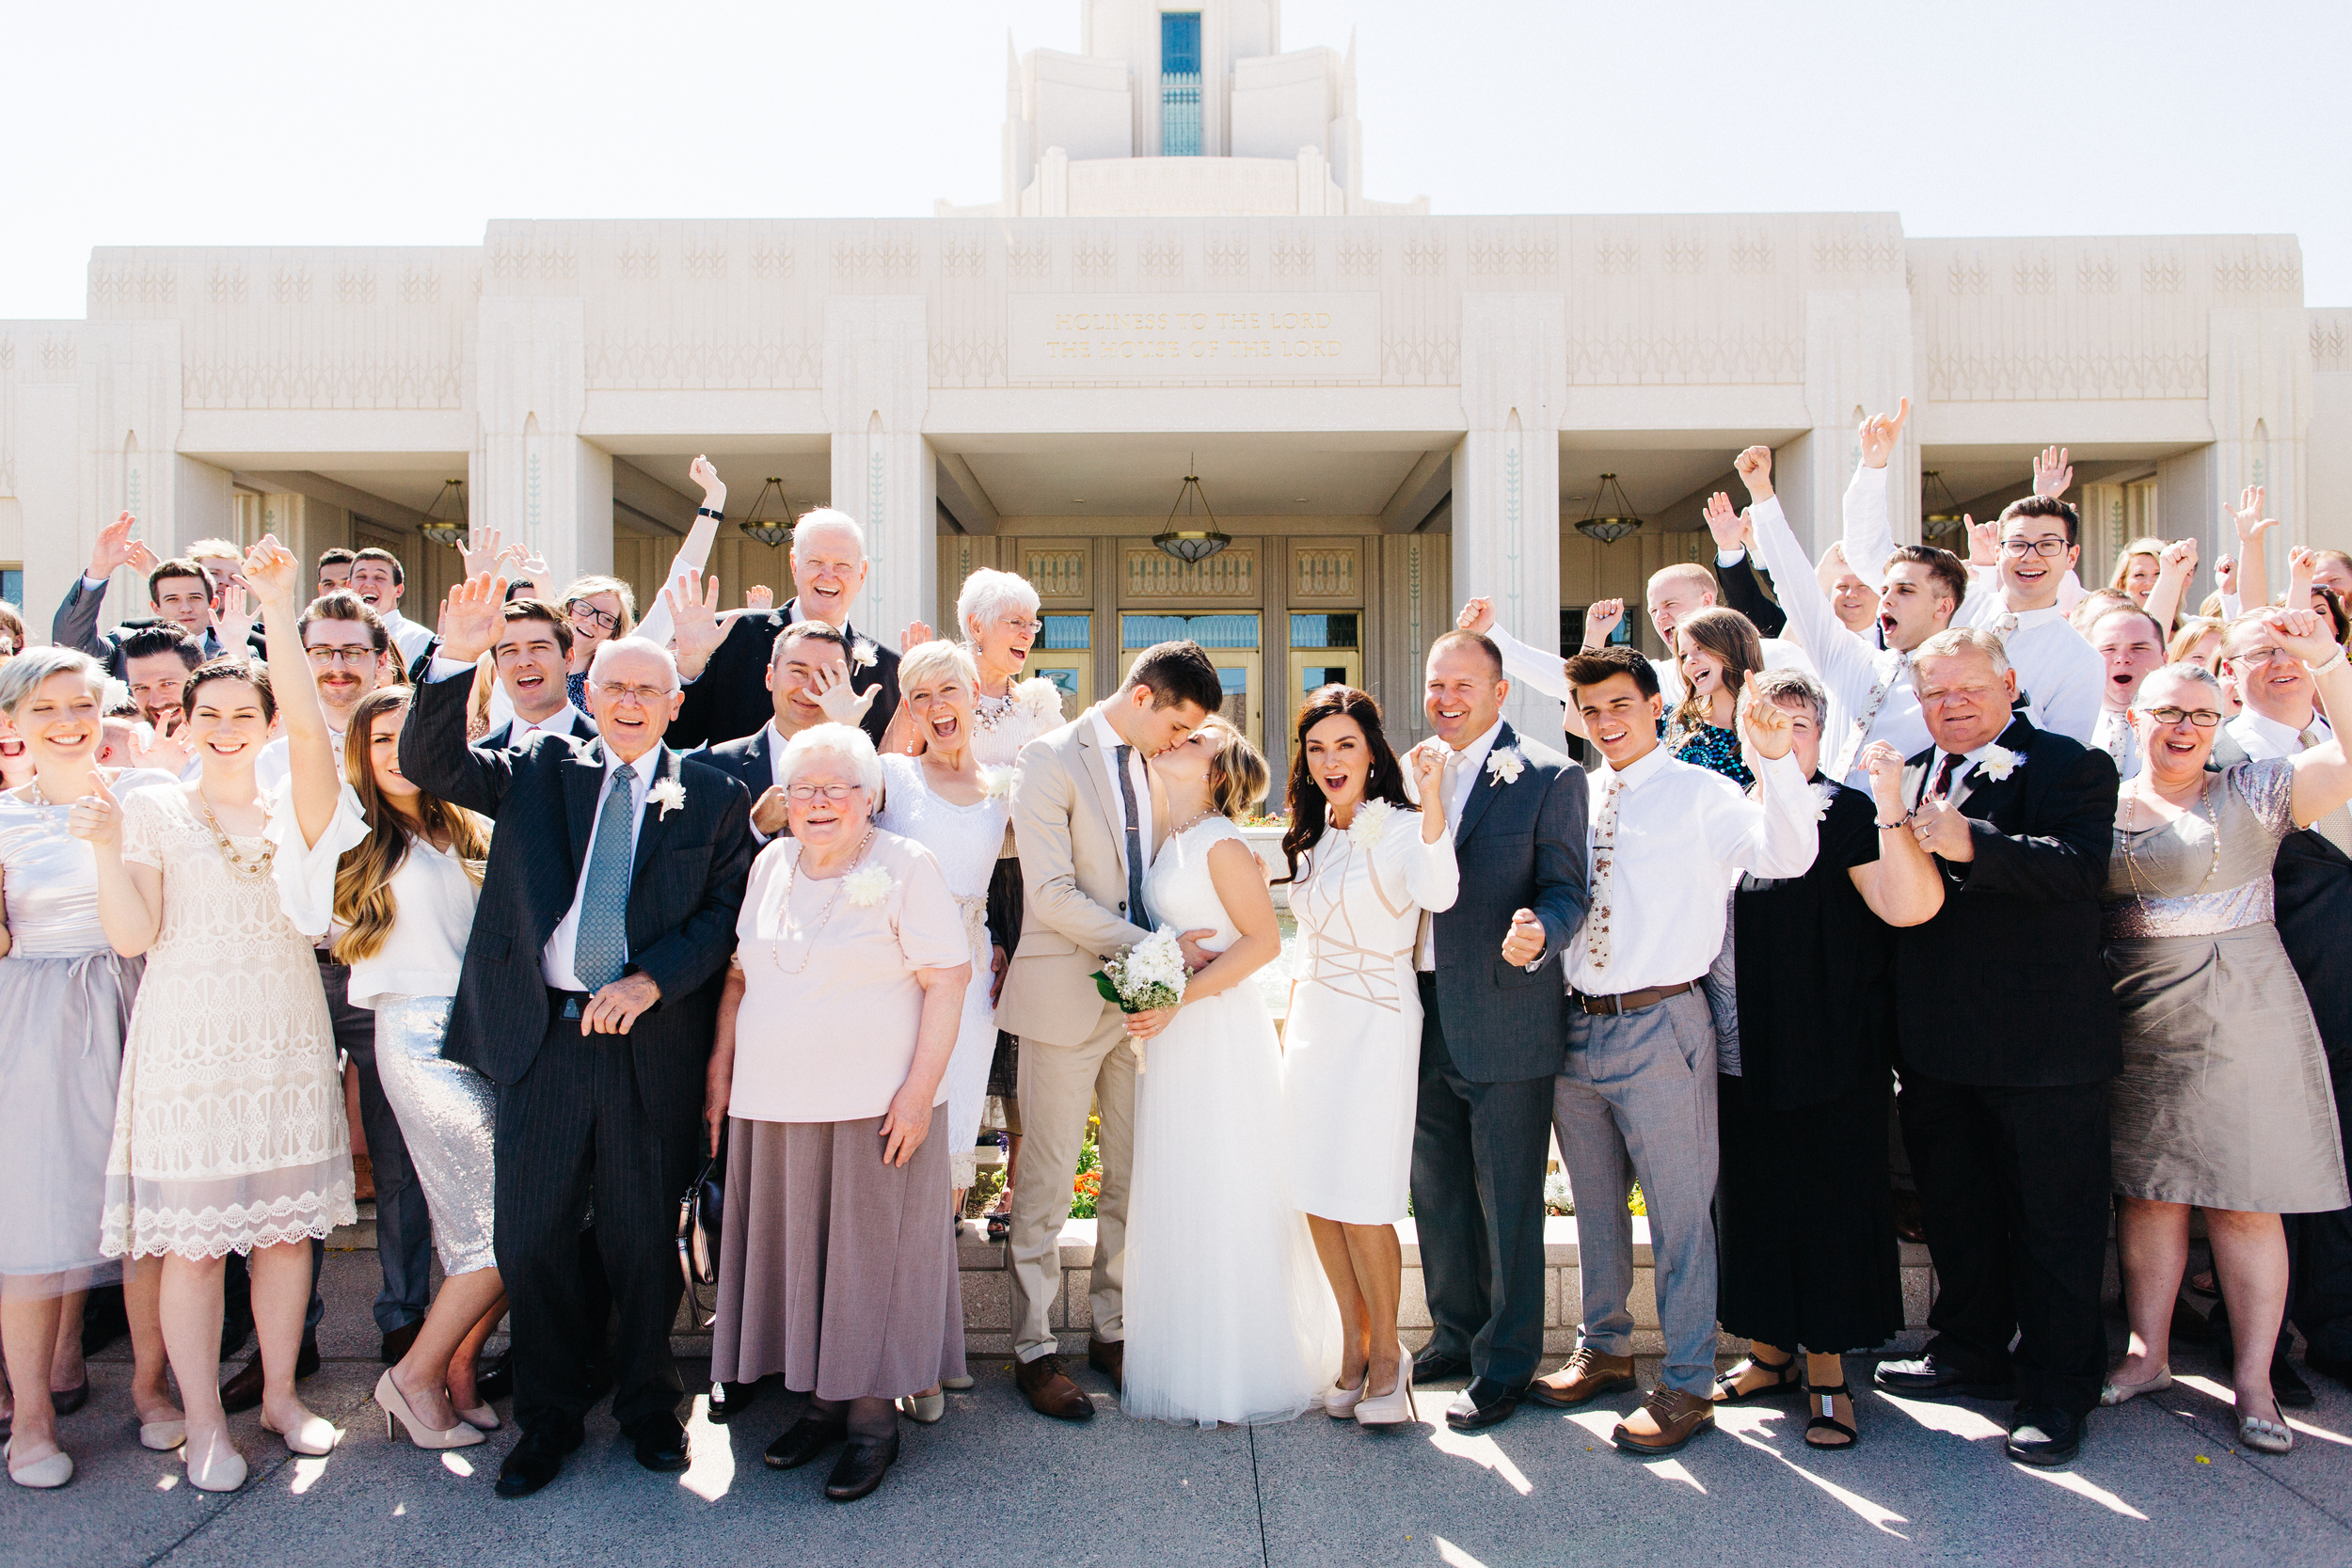 KennedyWyatt_WeddingDay-30.jpg